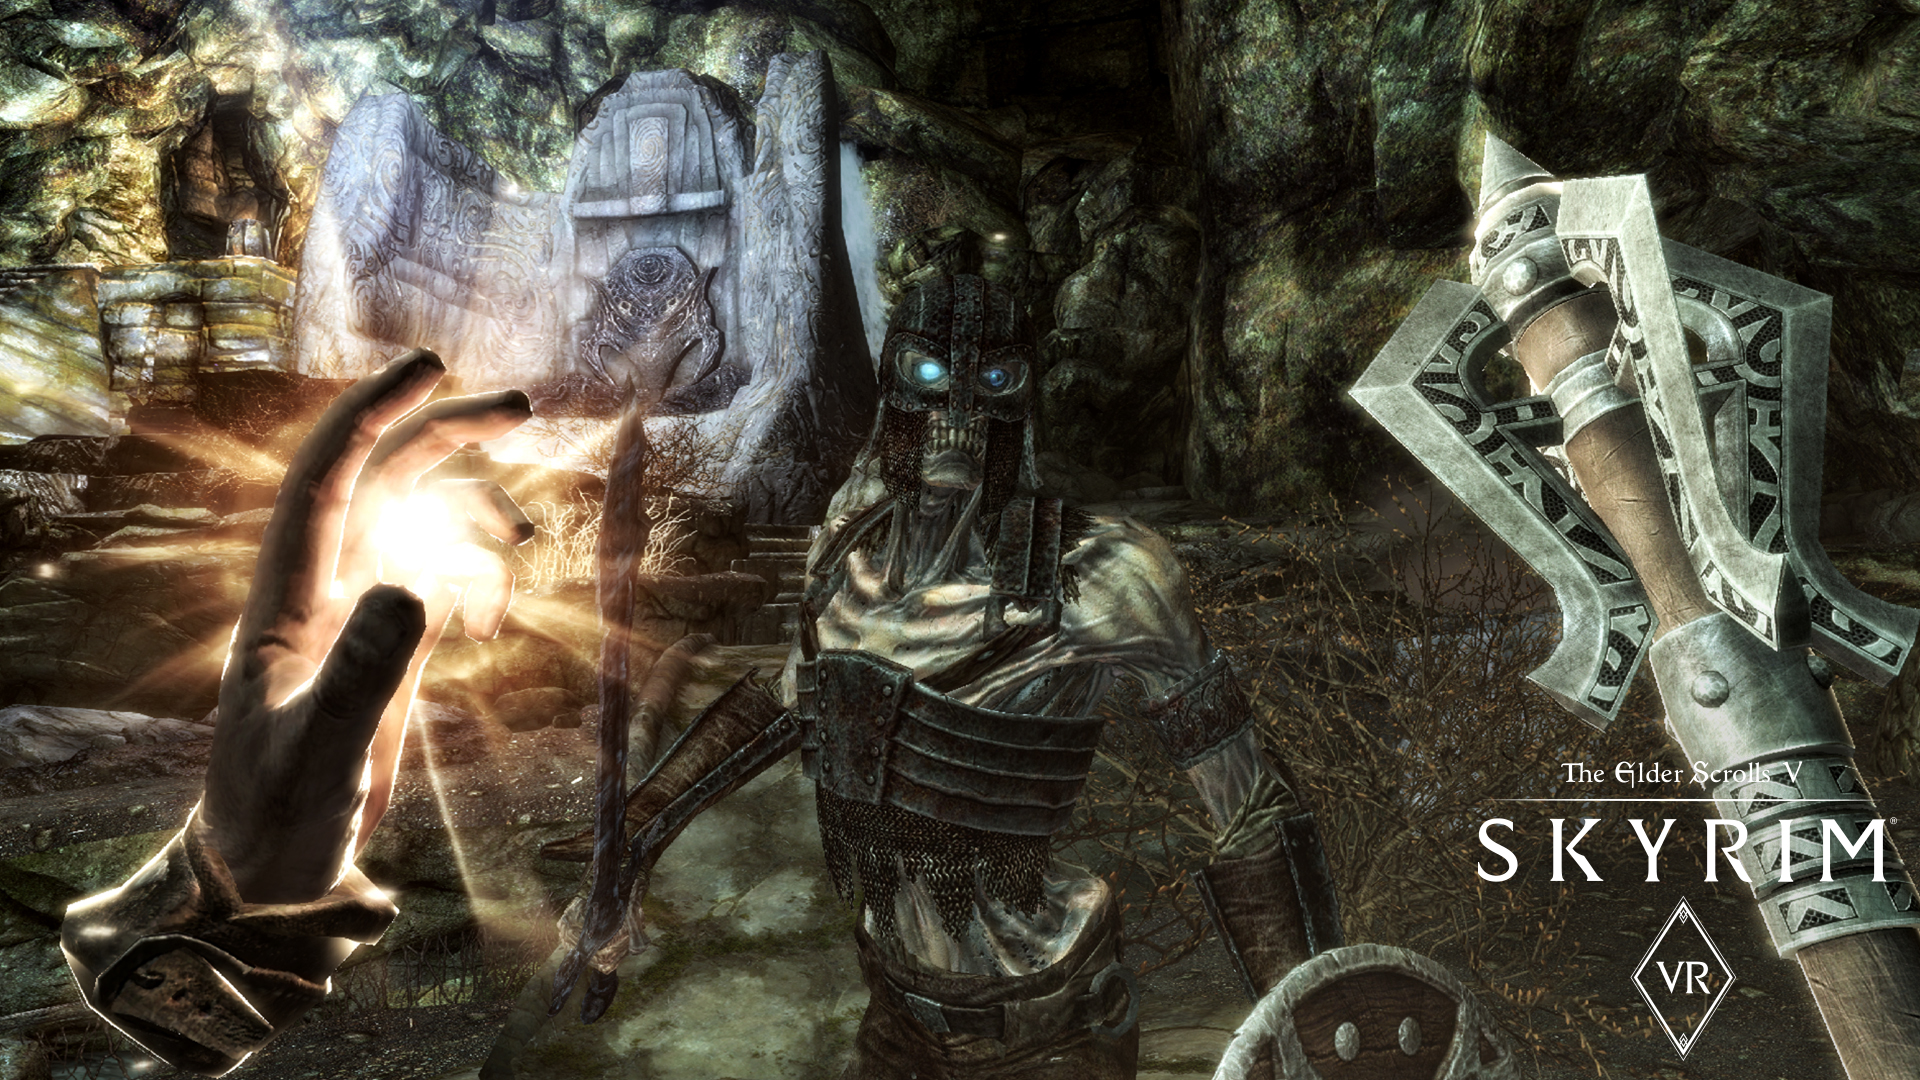 Skyrim-Mods: Armee der Finsternist, Sexy Daedric Armor